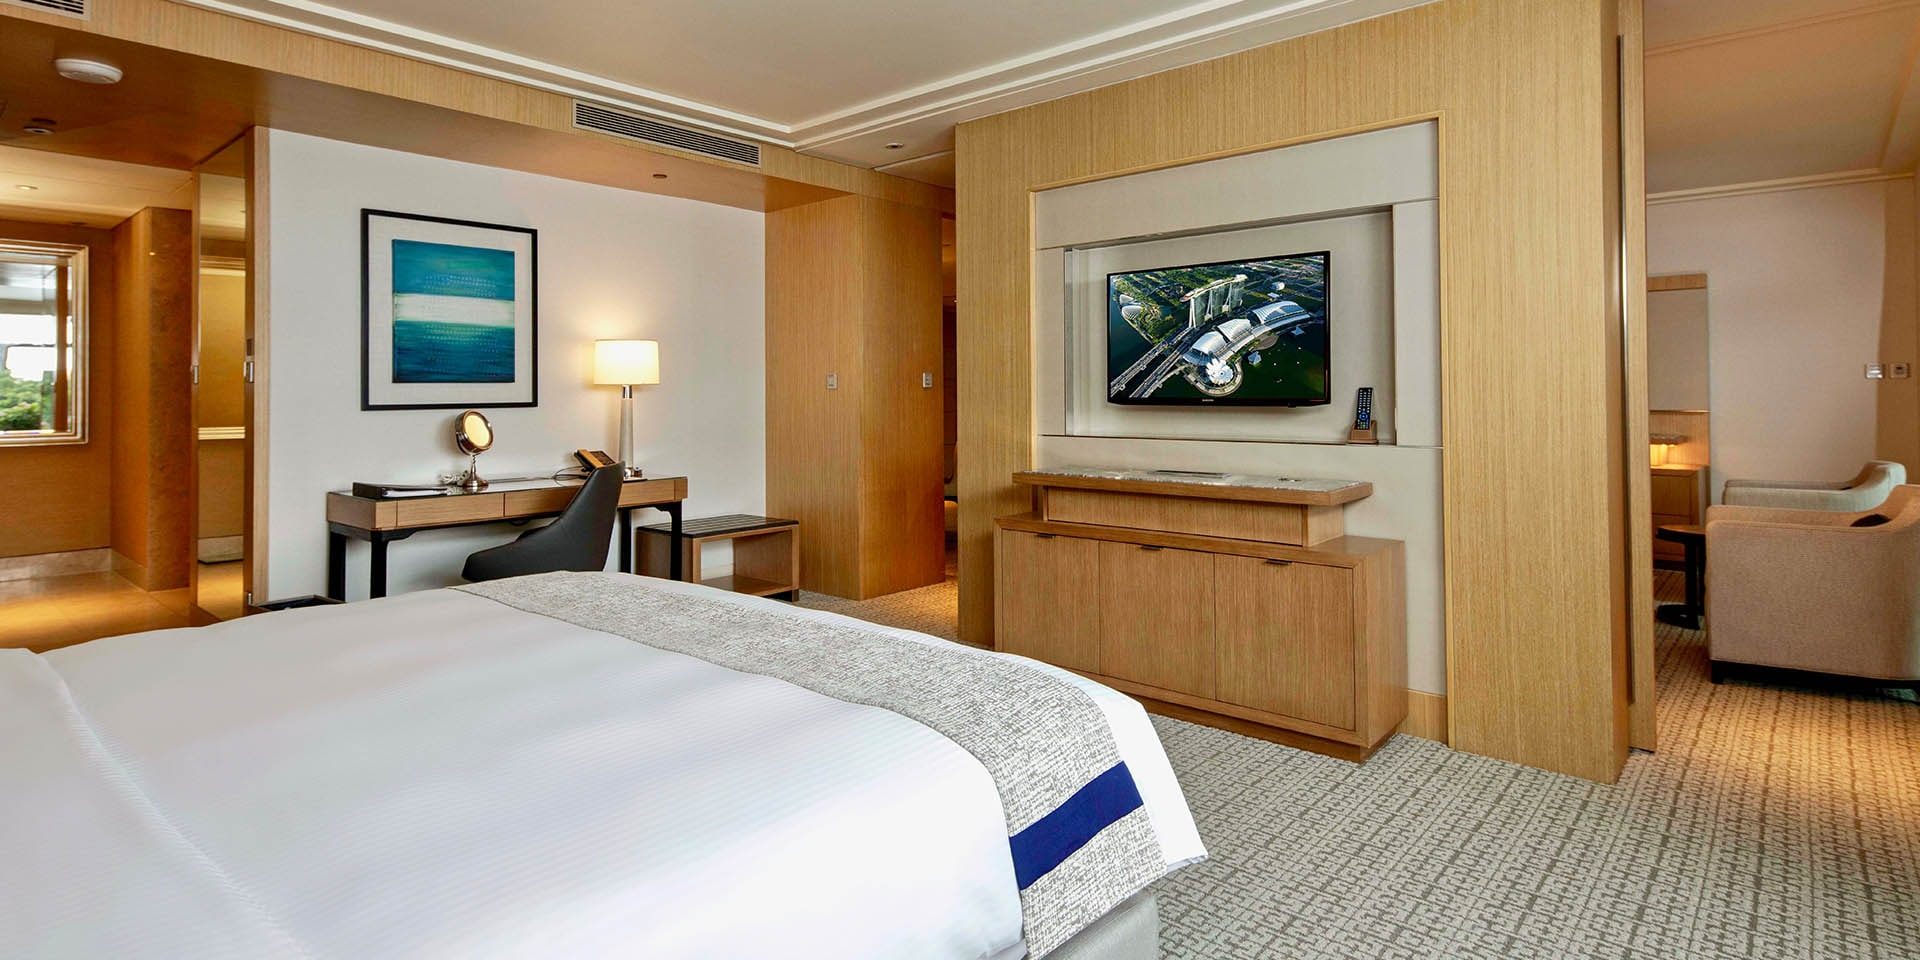 Family Room In Marina Bay Sands Singapore Hotel